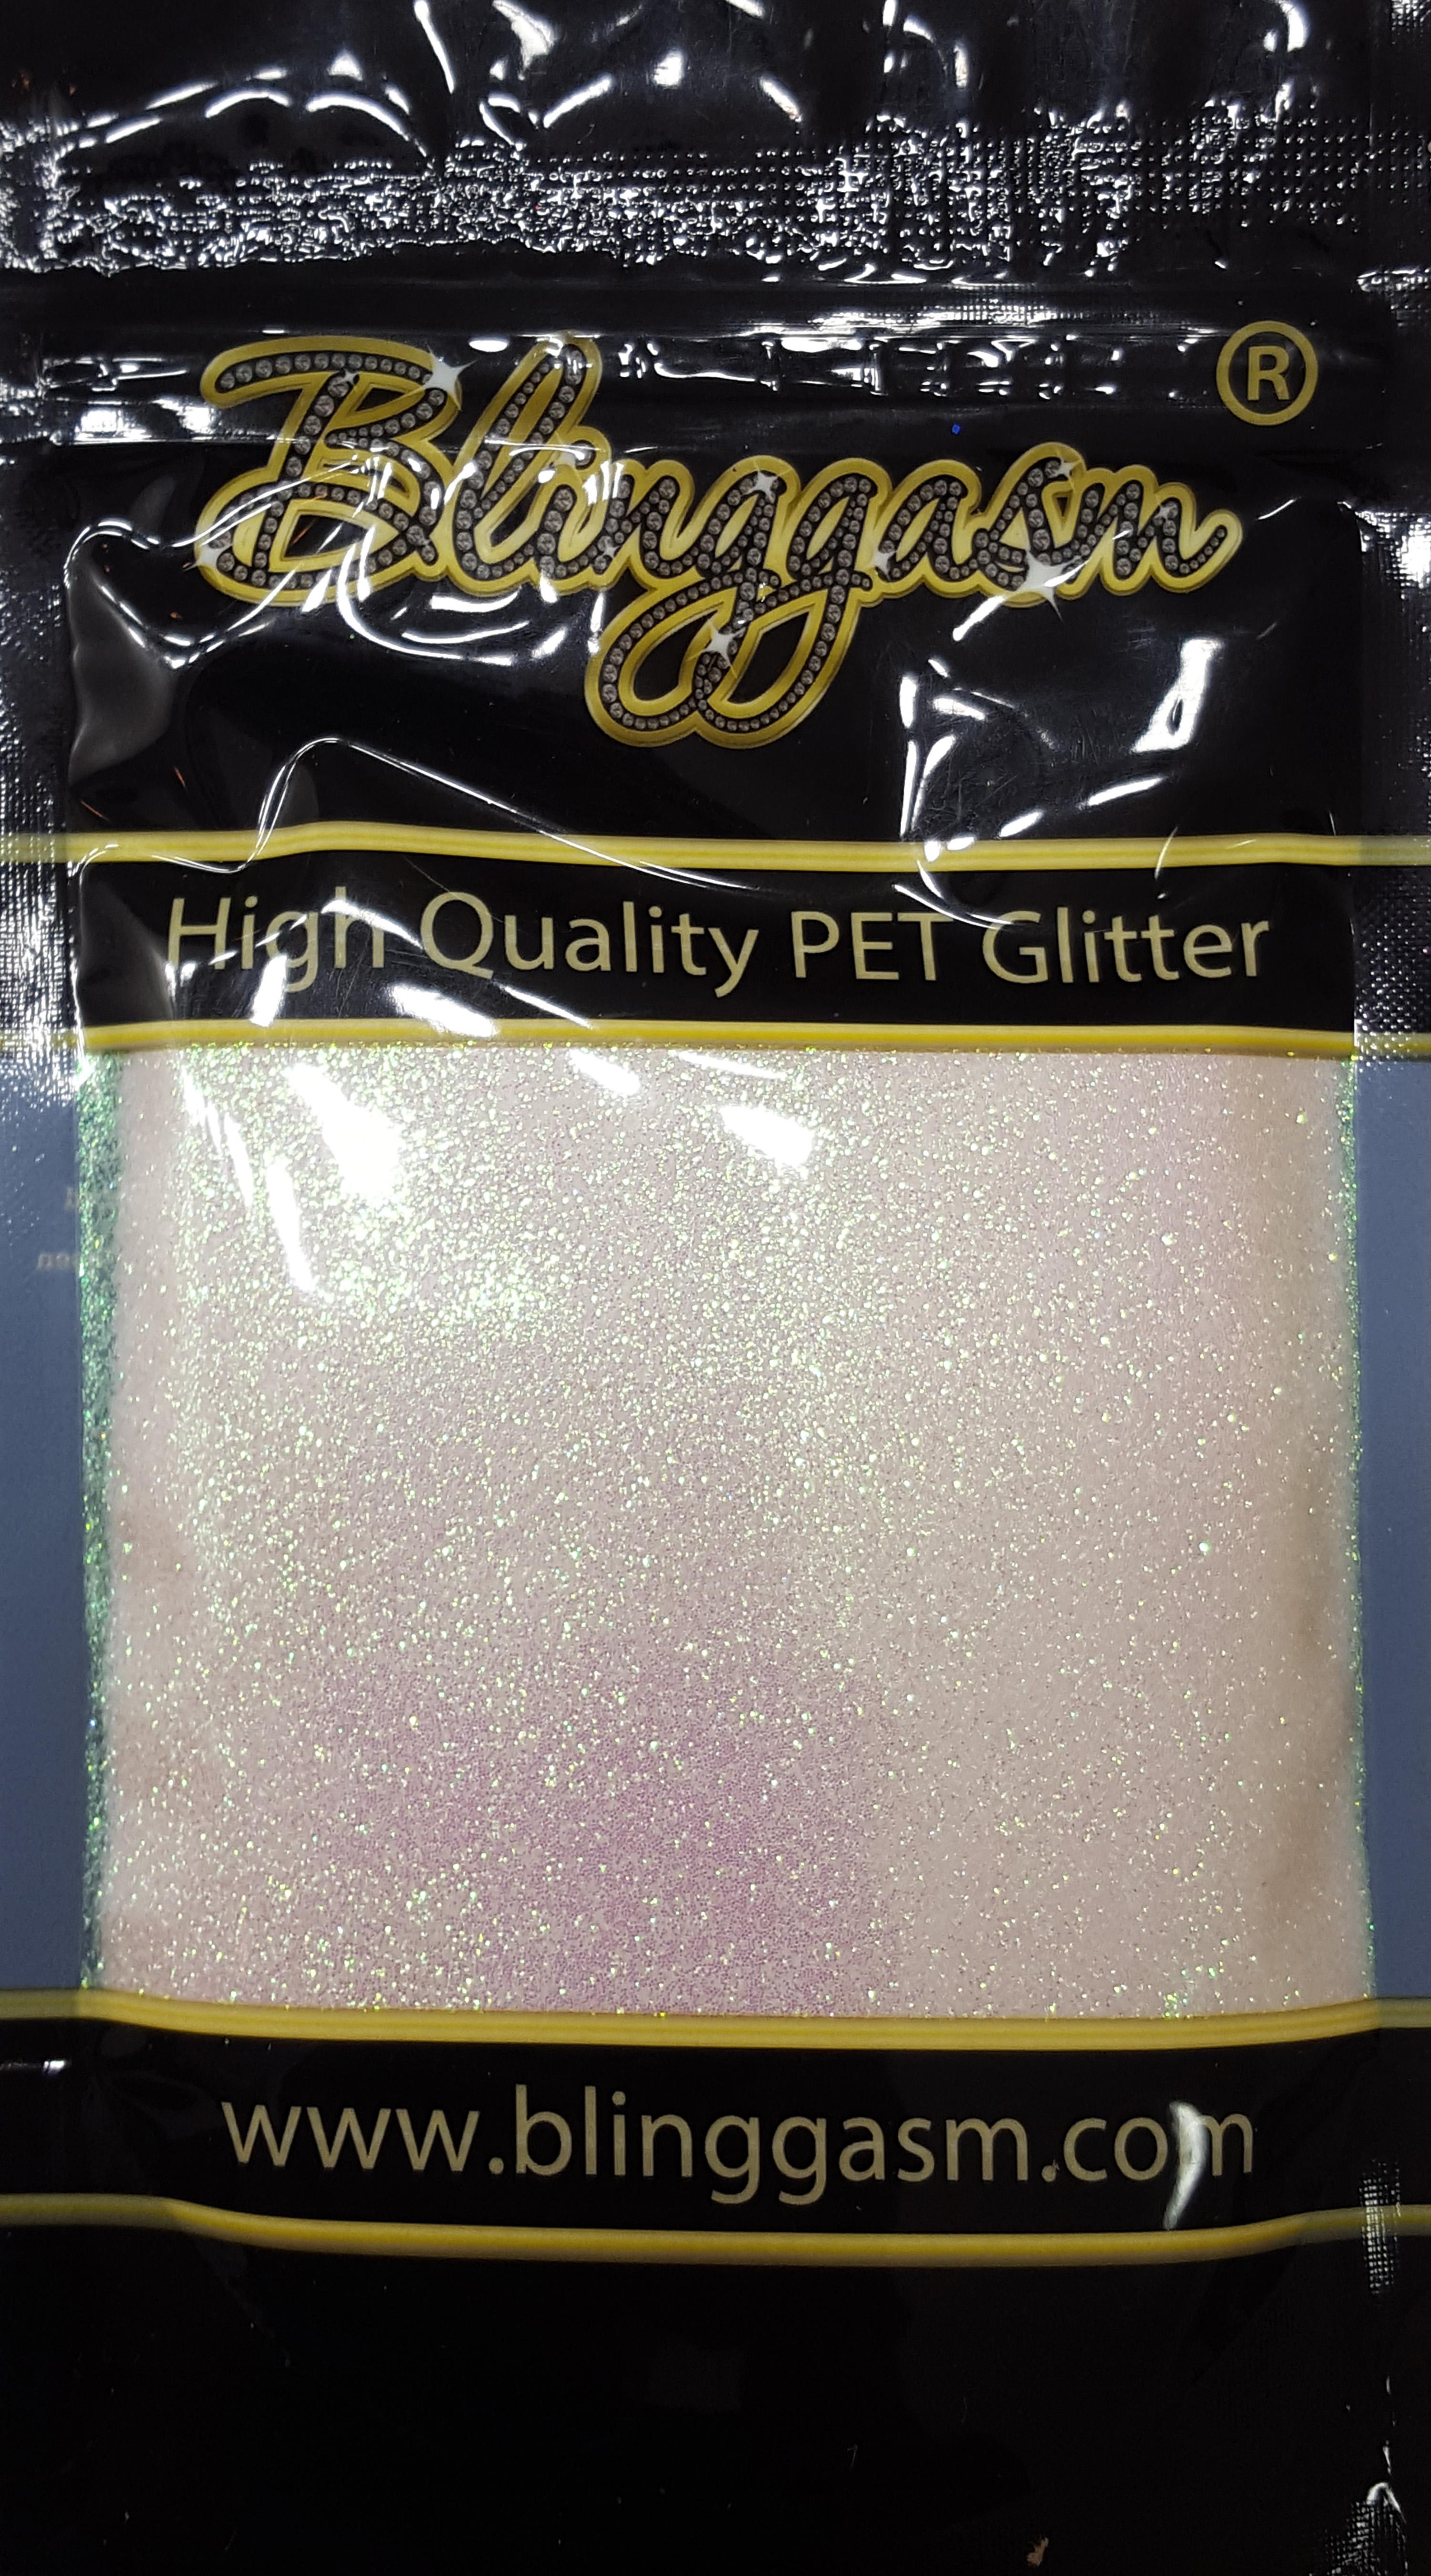 SHOP CLOSING 22mm Plugs 78 Silver Rainbow Glitz Holographic Glitter Plugs Single Flare Ready To Ship Bonus Gift